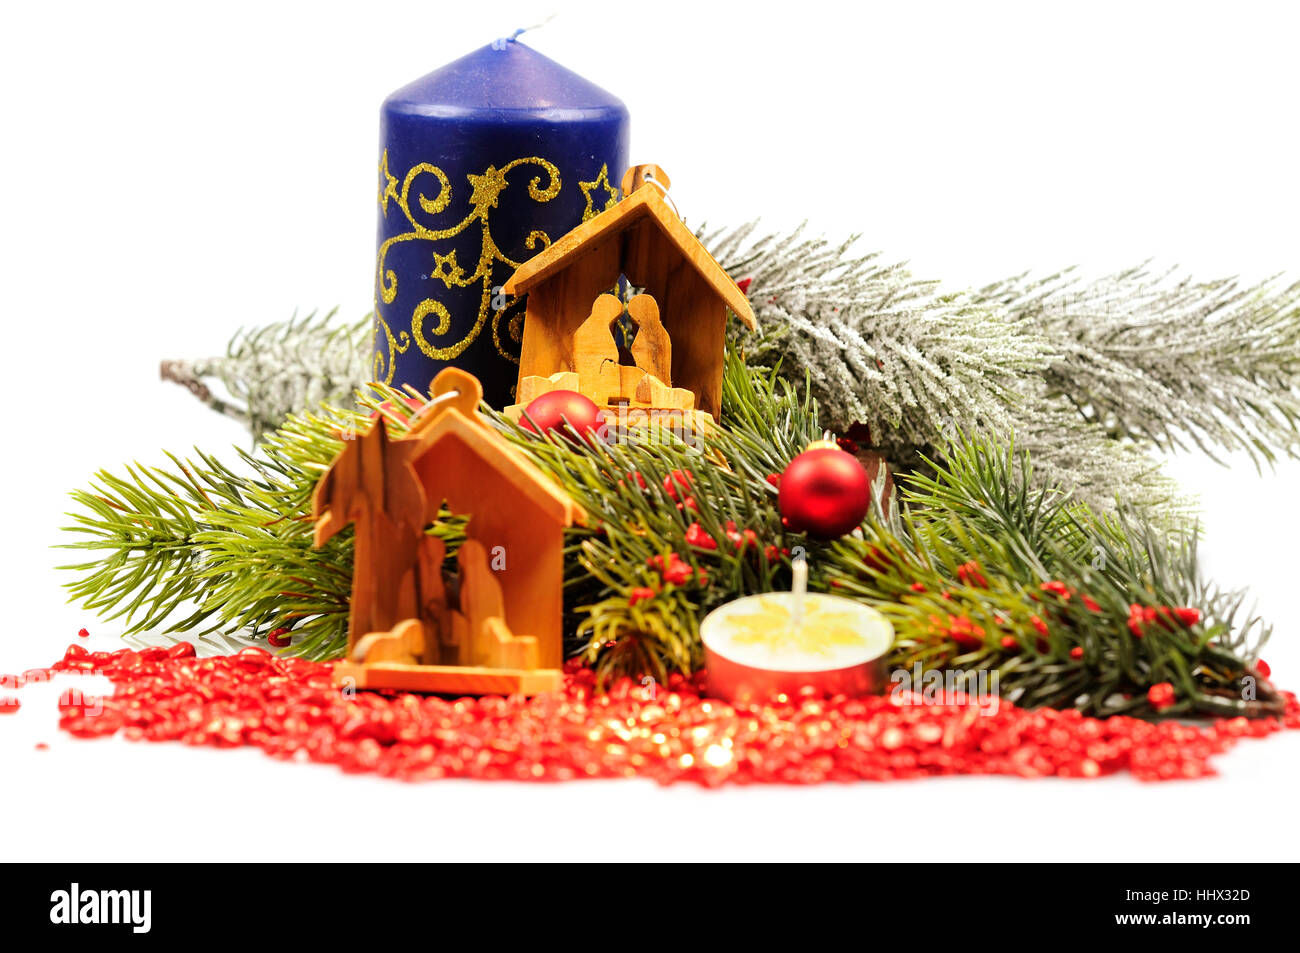 Deco Decoration Manger Creche Christmas Xmas X Mas Tannin